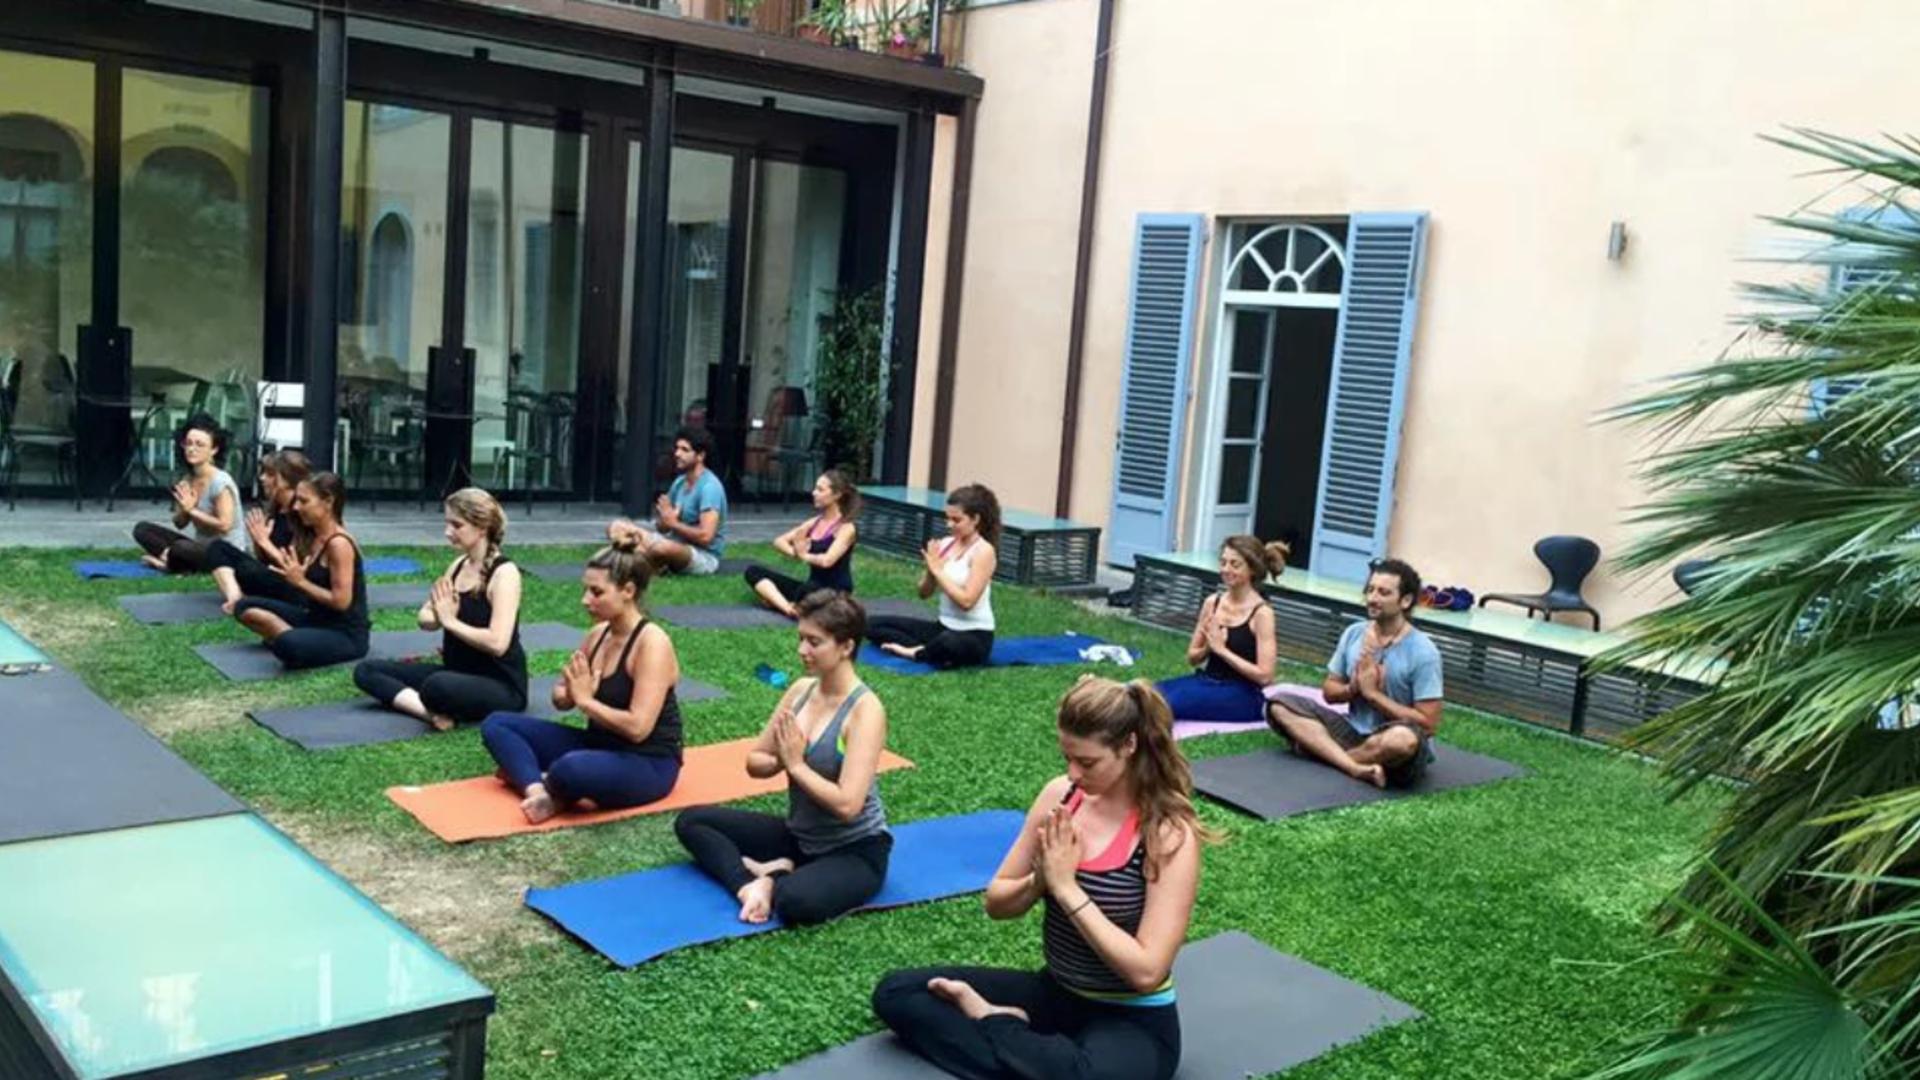 Italia Power Yoga - Santo Spirito prezzi